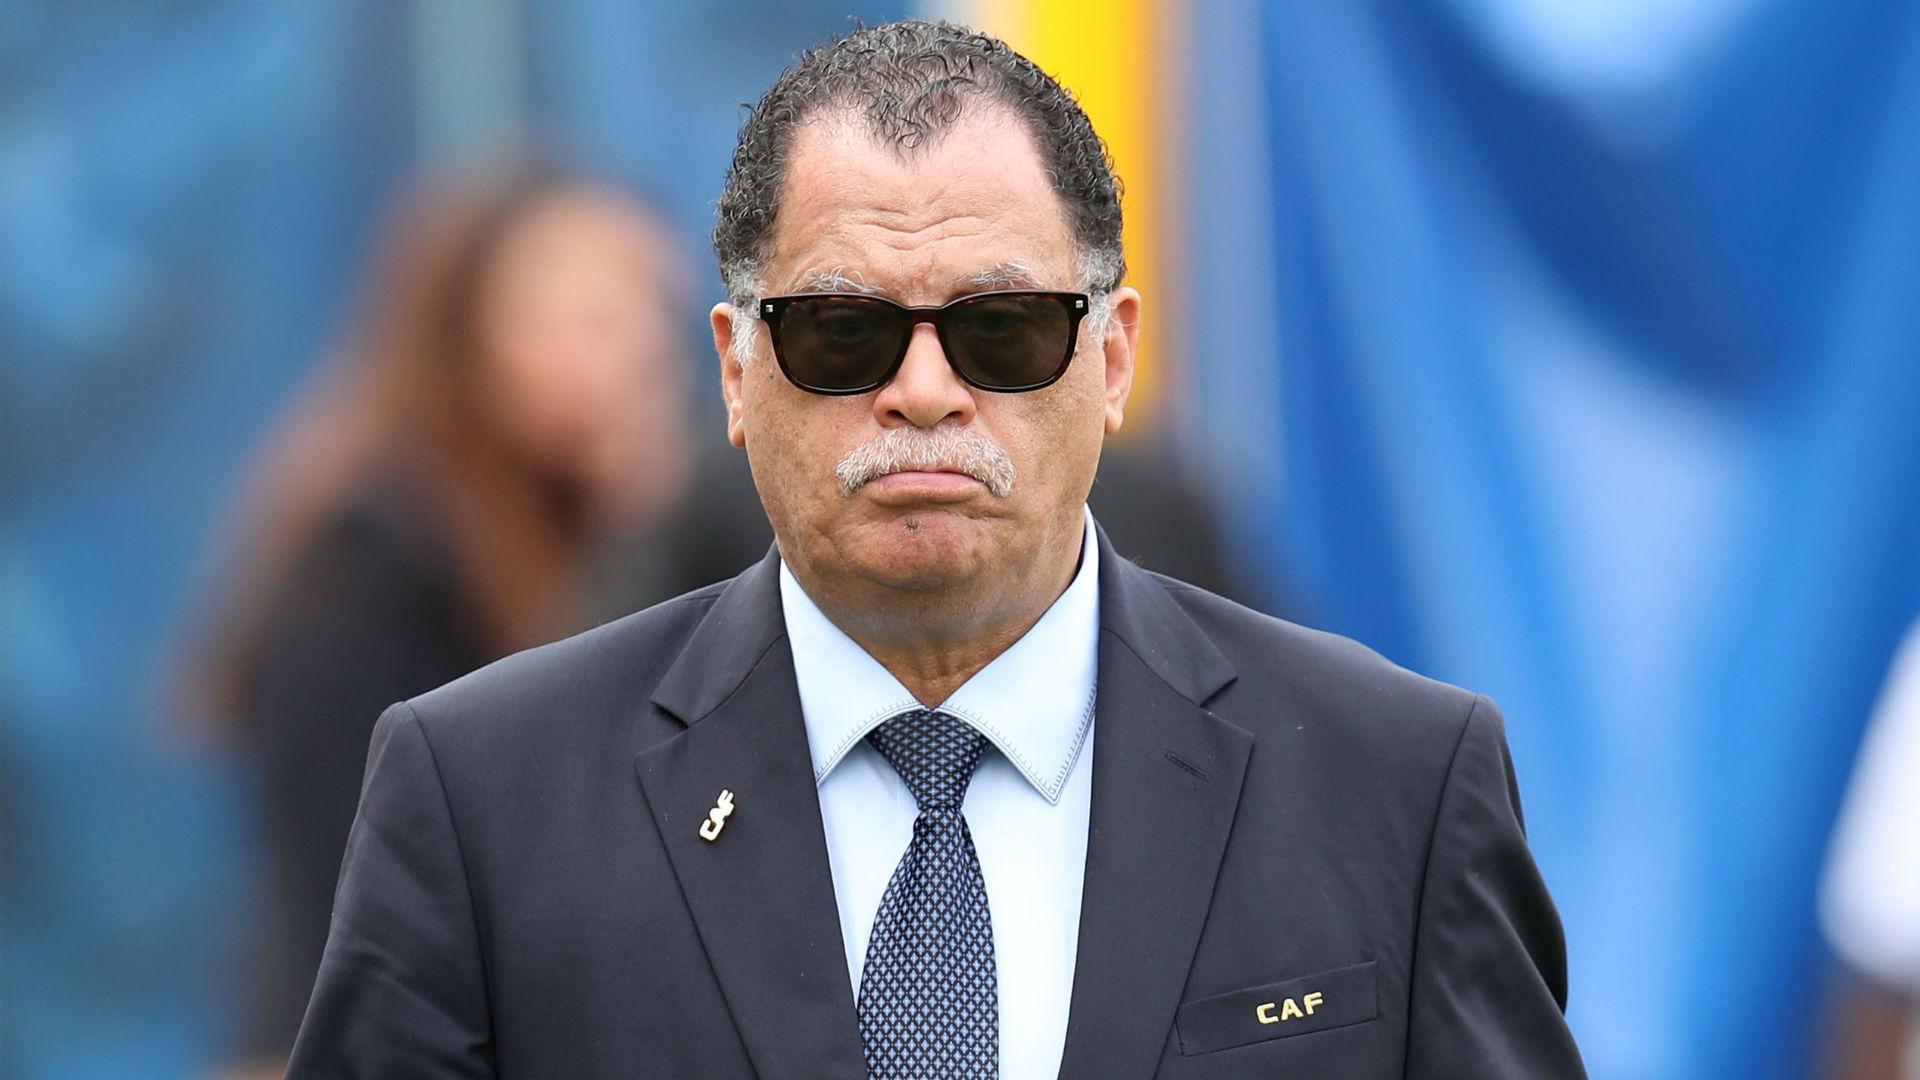 Coronavirus: No need to panic and postpone South African football - Safa